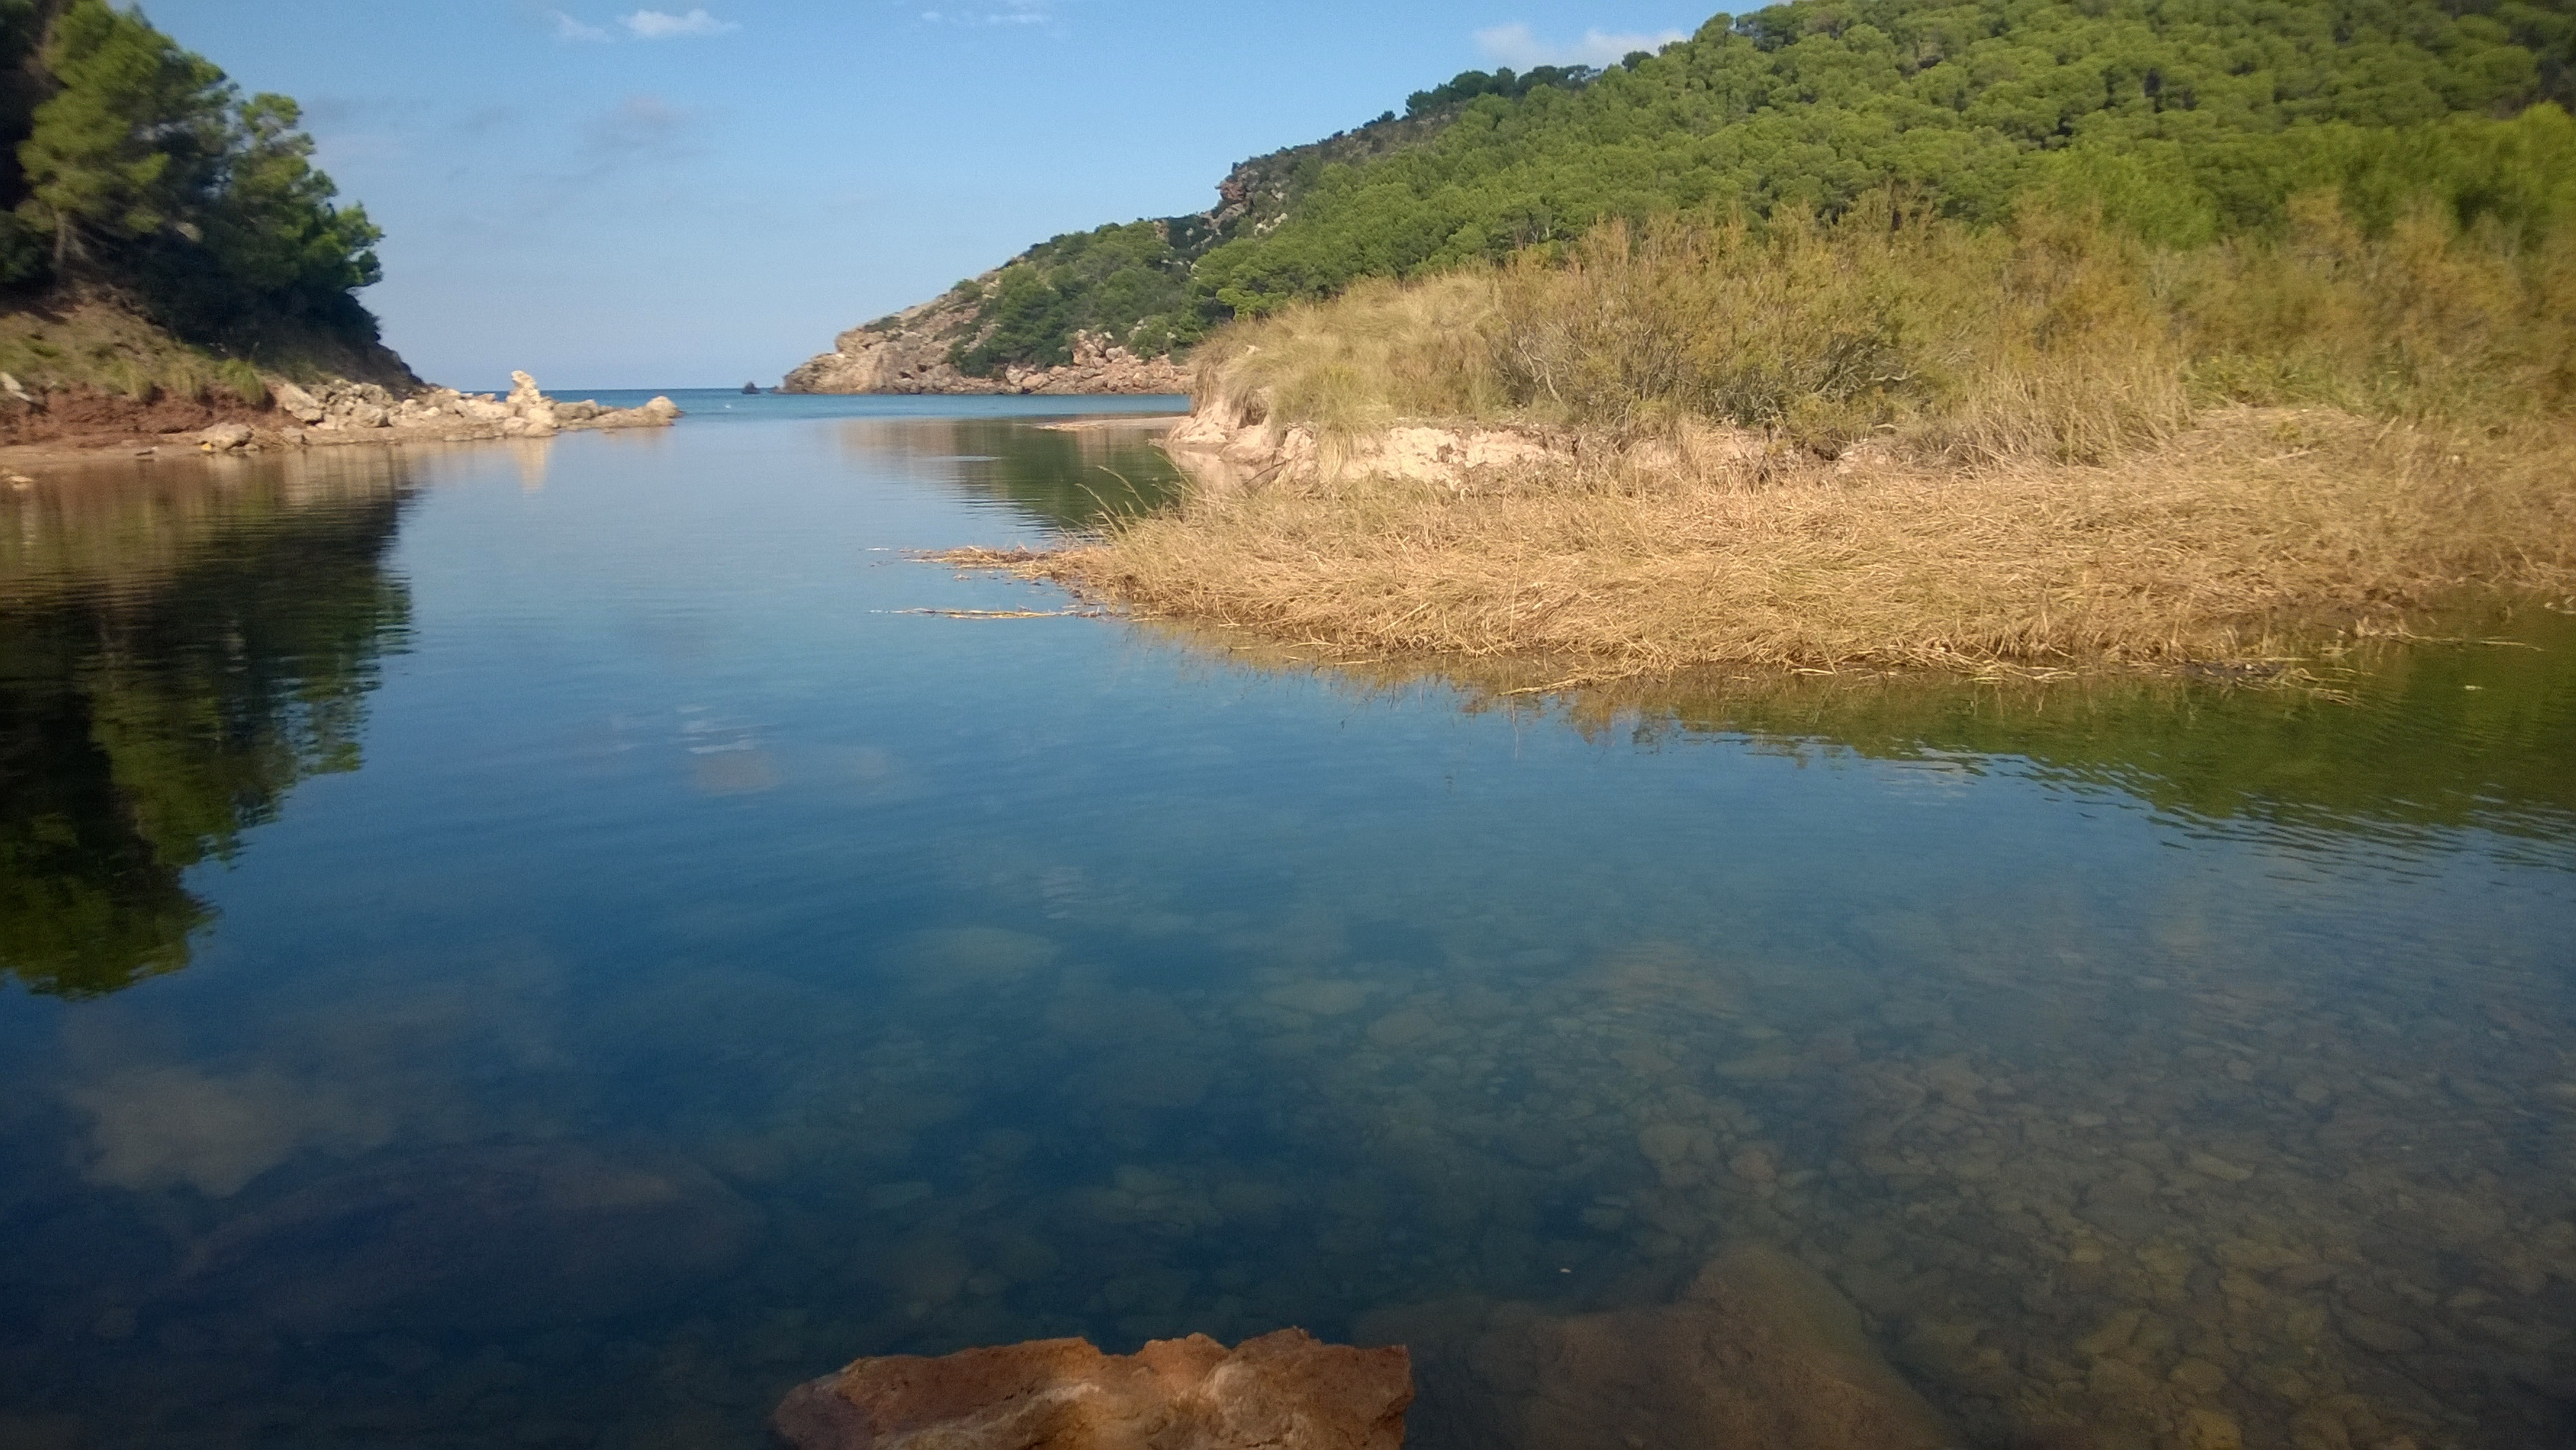 Playa Des Bot, Ciutadella de Menorca, Balearic Islands, Spain